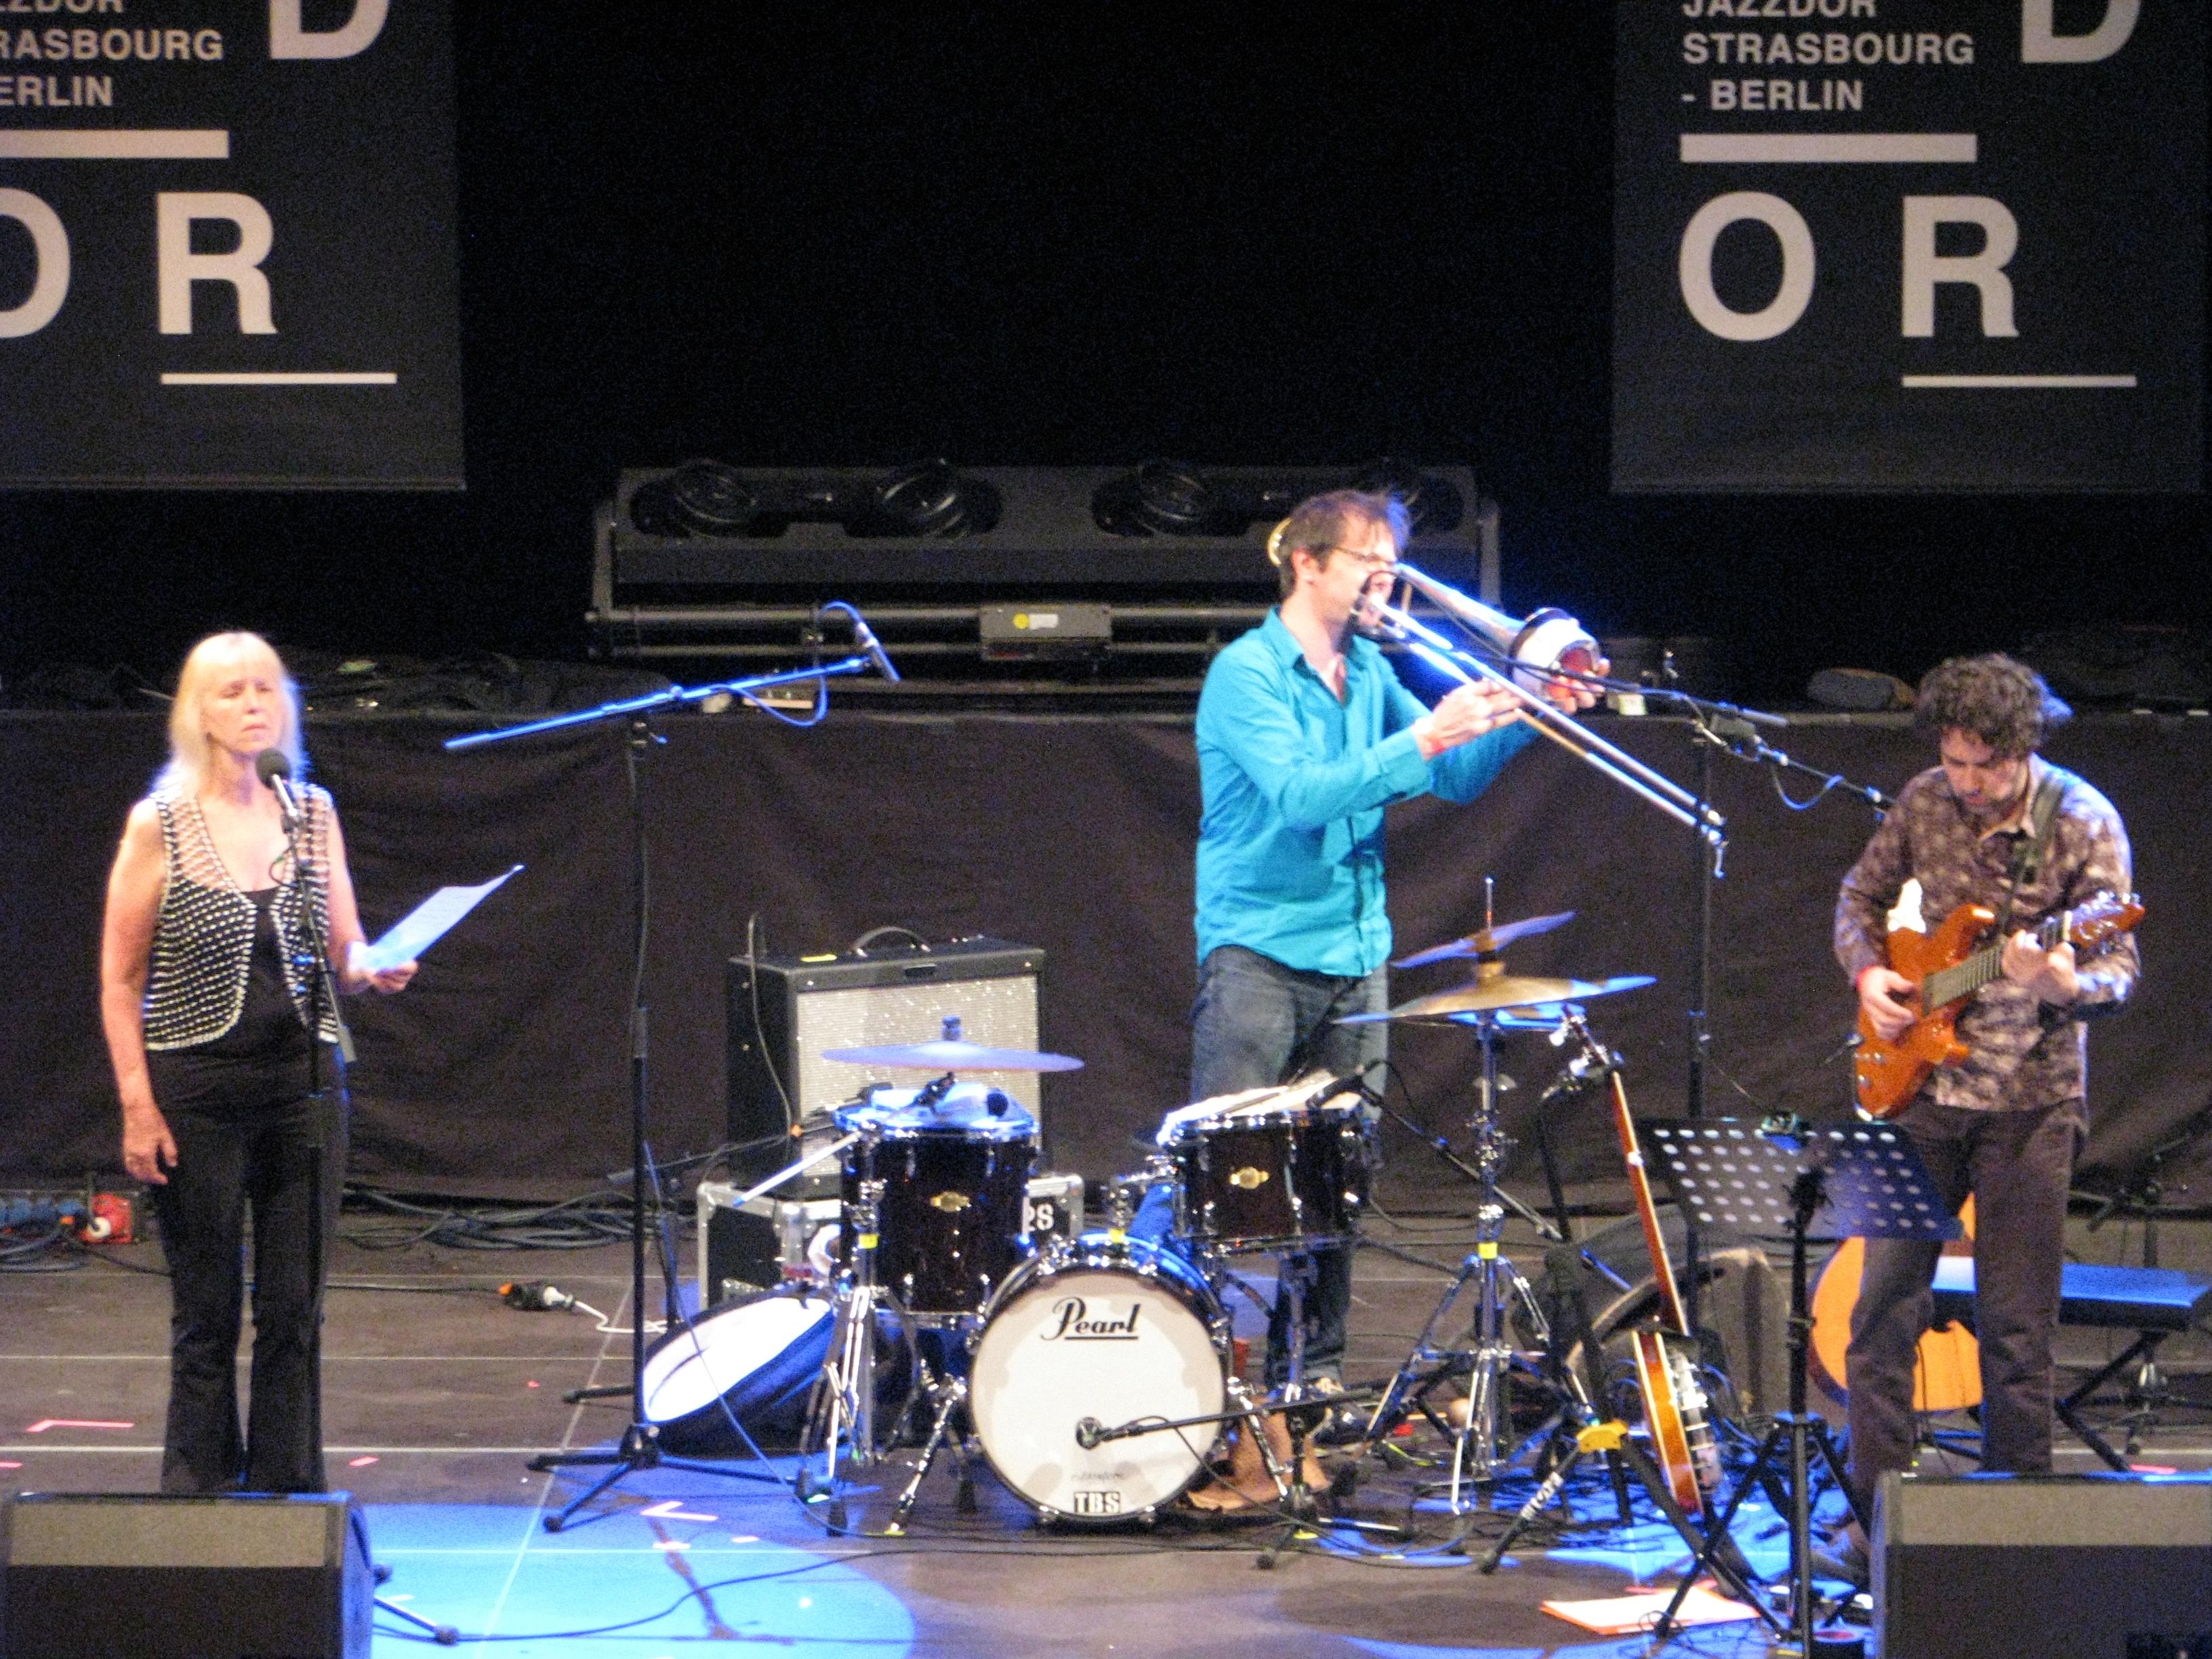 Maggie nicols denis charolles david chevallier jazzdor berlin 2013